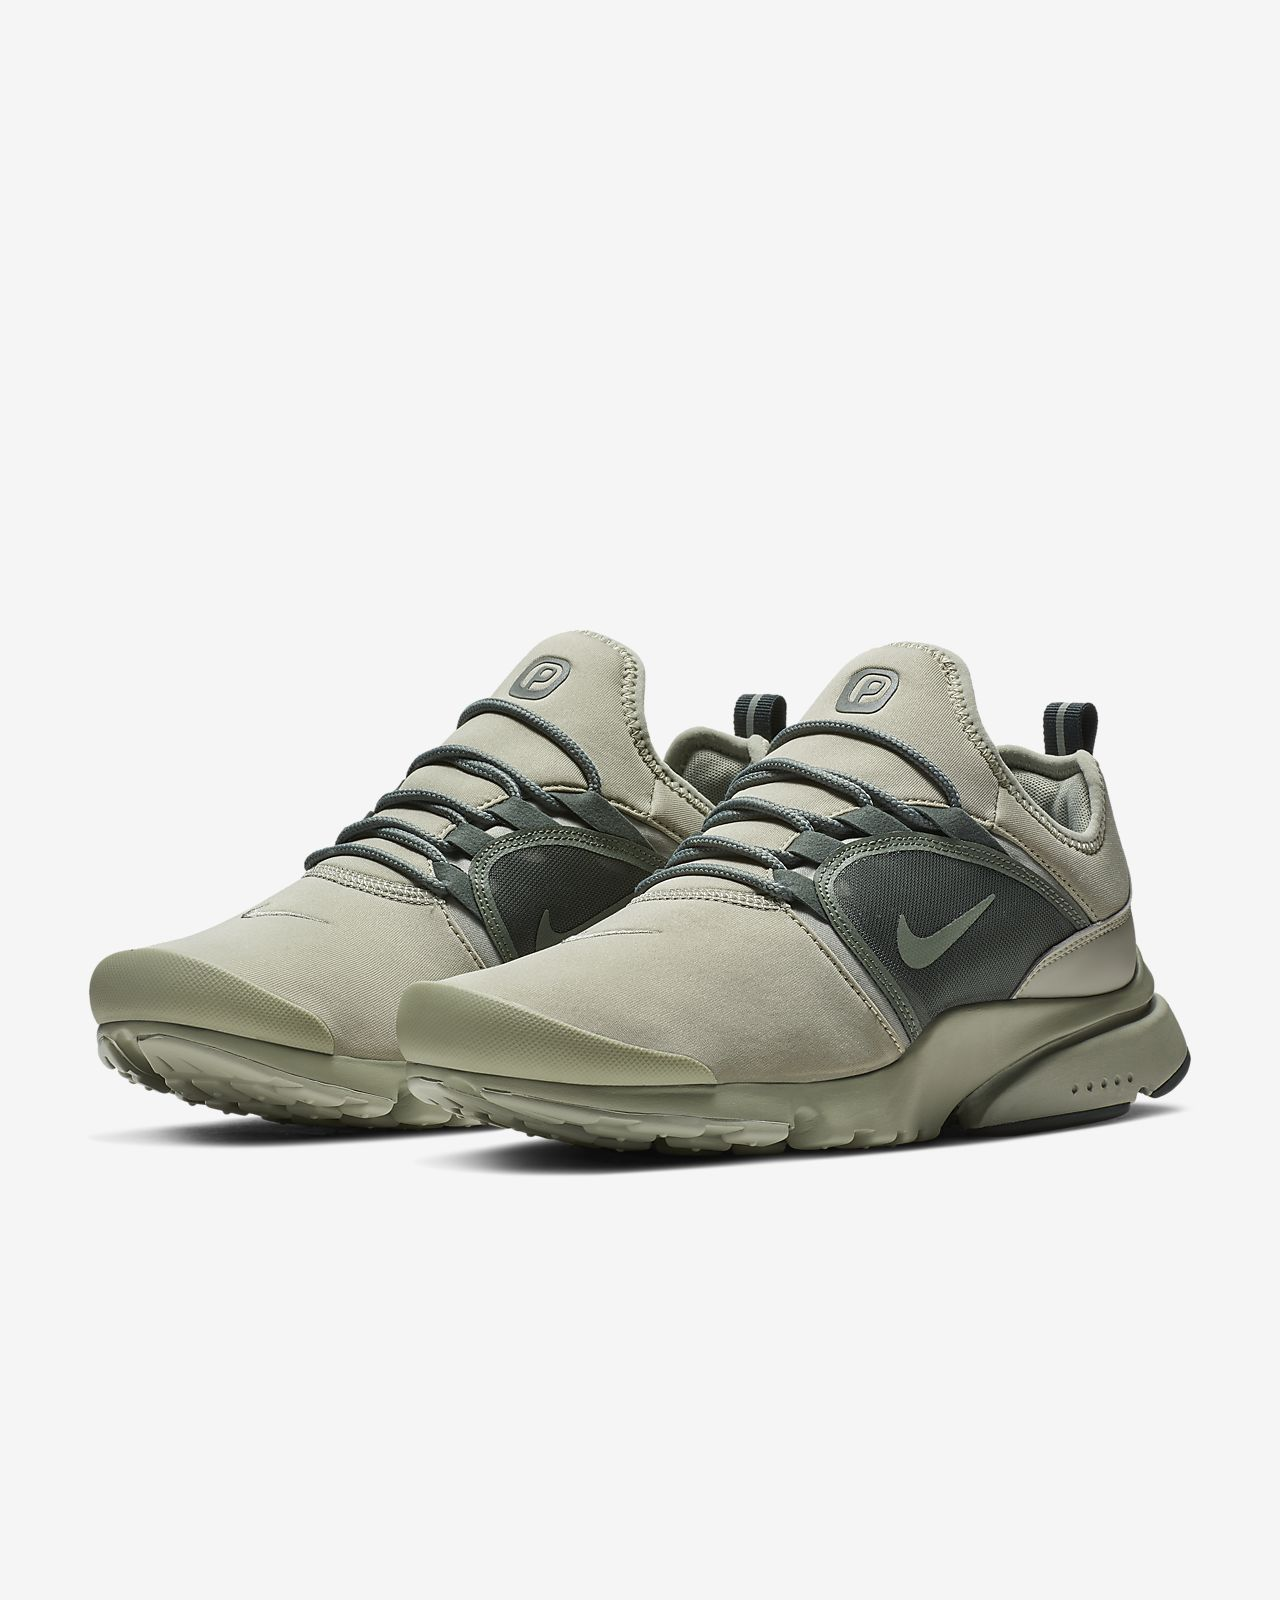 6799220fd637 Nike Presto Fly World Men s Shoe. Nike.com RO